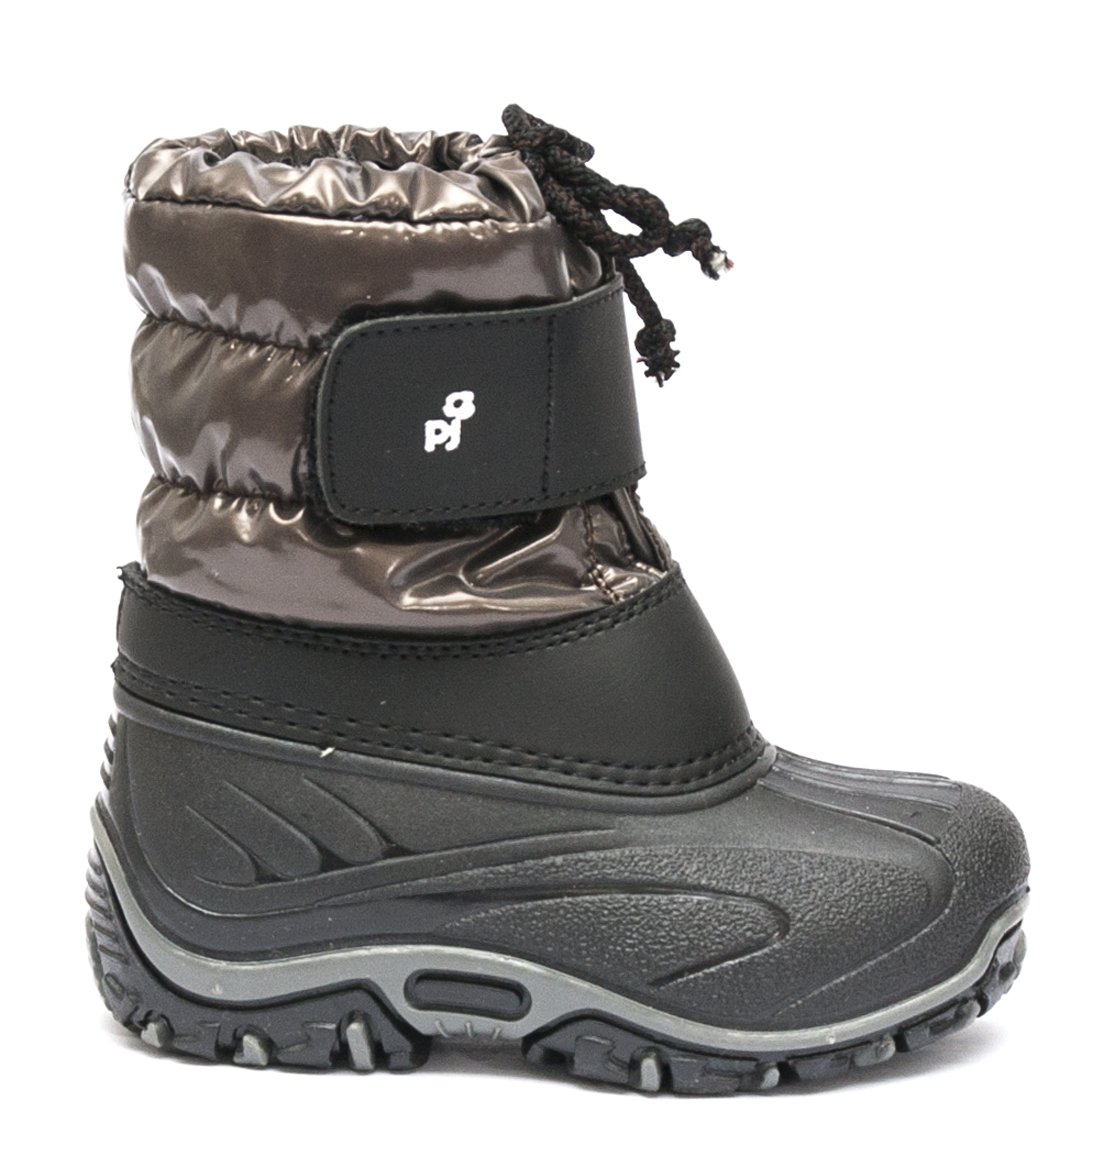 Apreskiuri copii pj shoes Fun maro negru 21-36